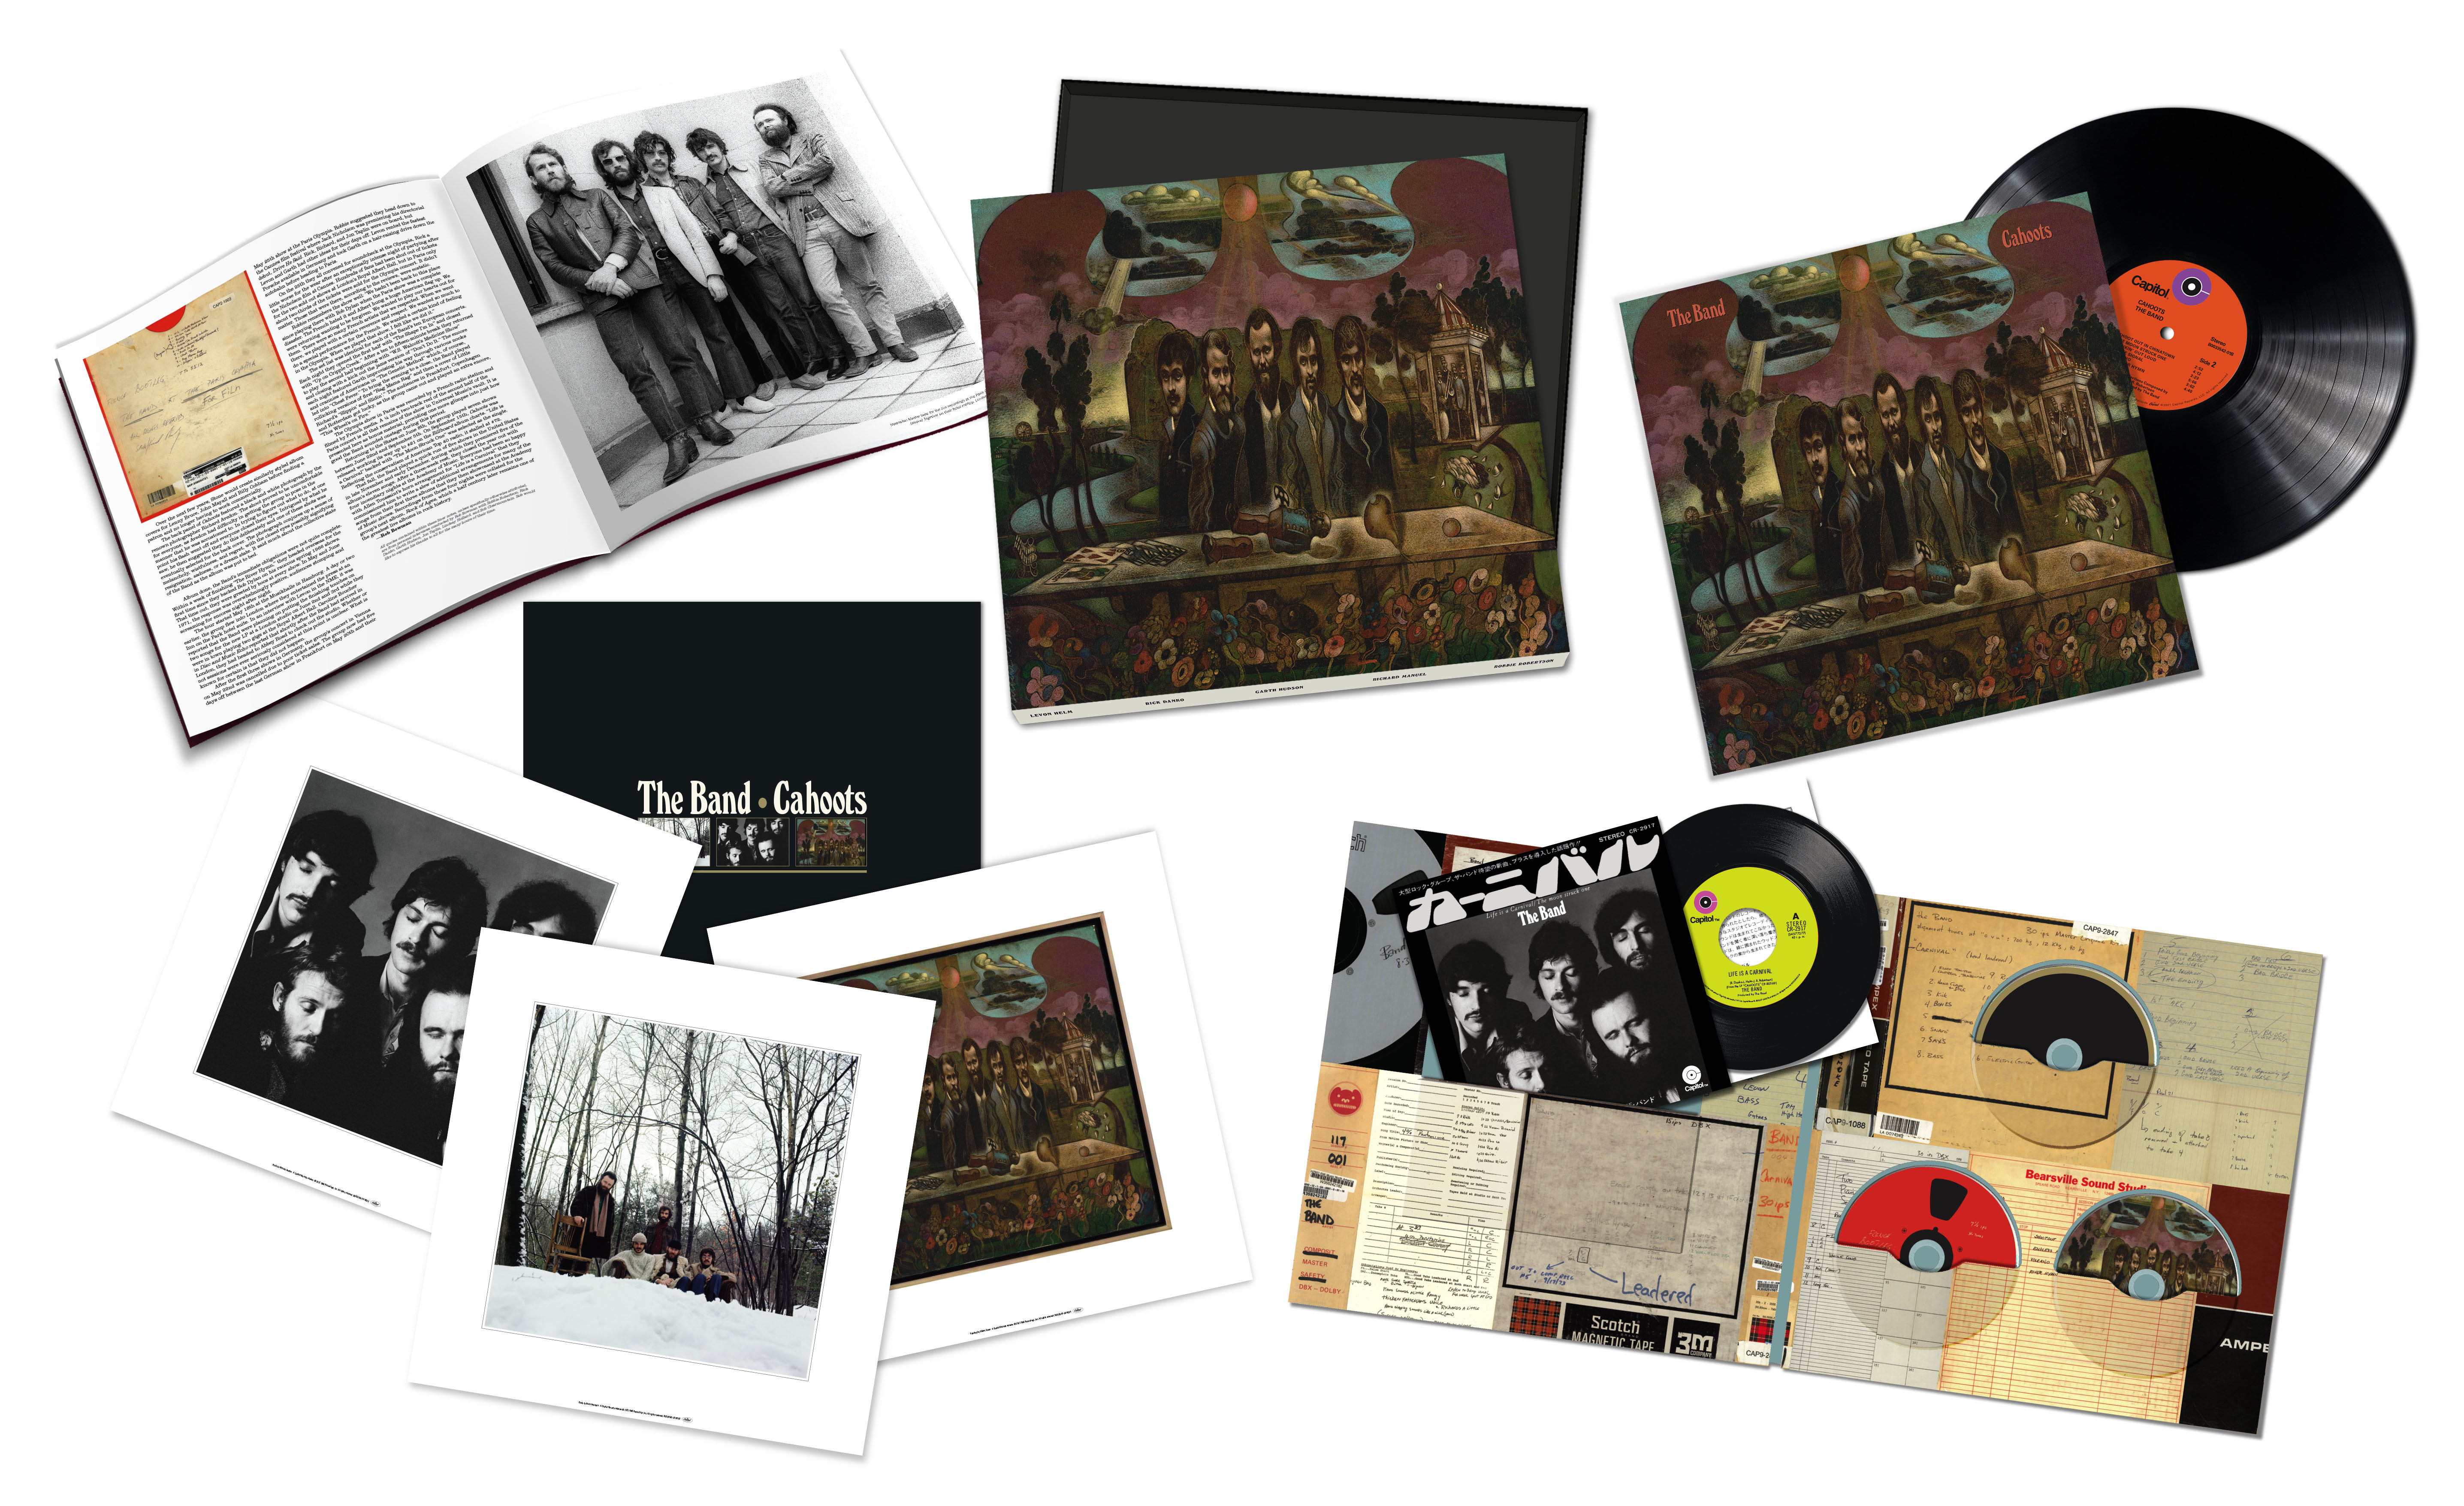 TheBand_Cahoots Deluxe packshot.jpg